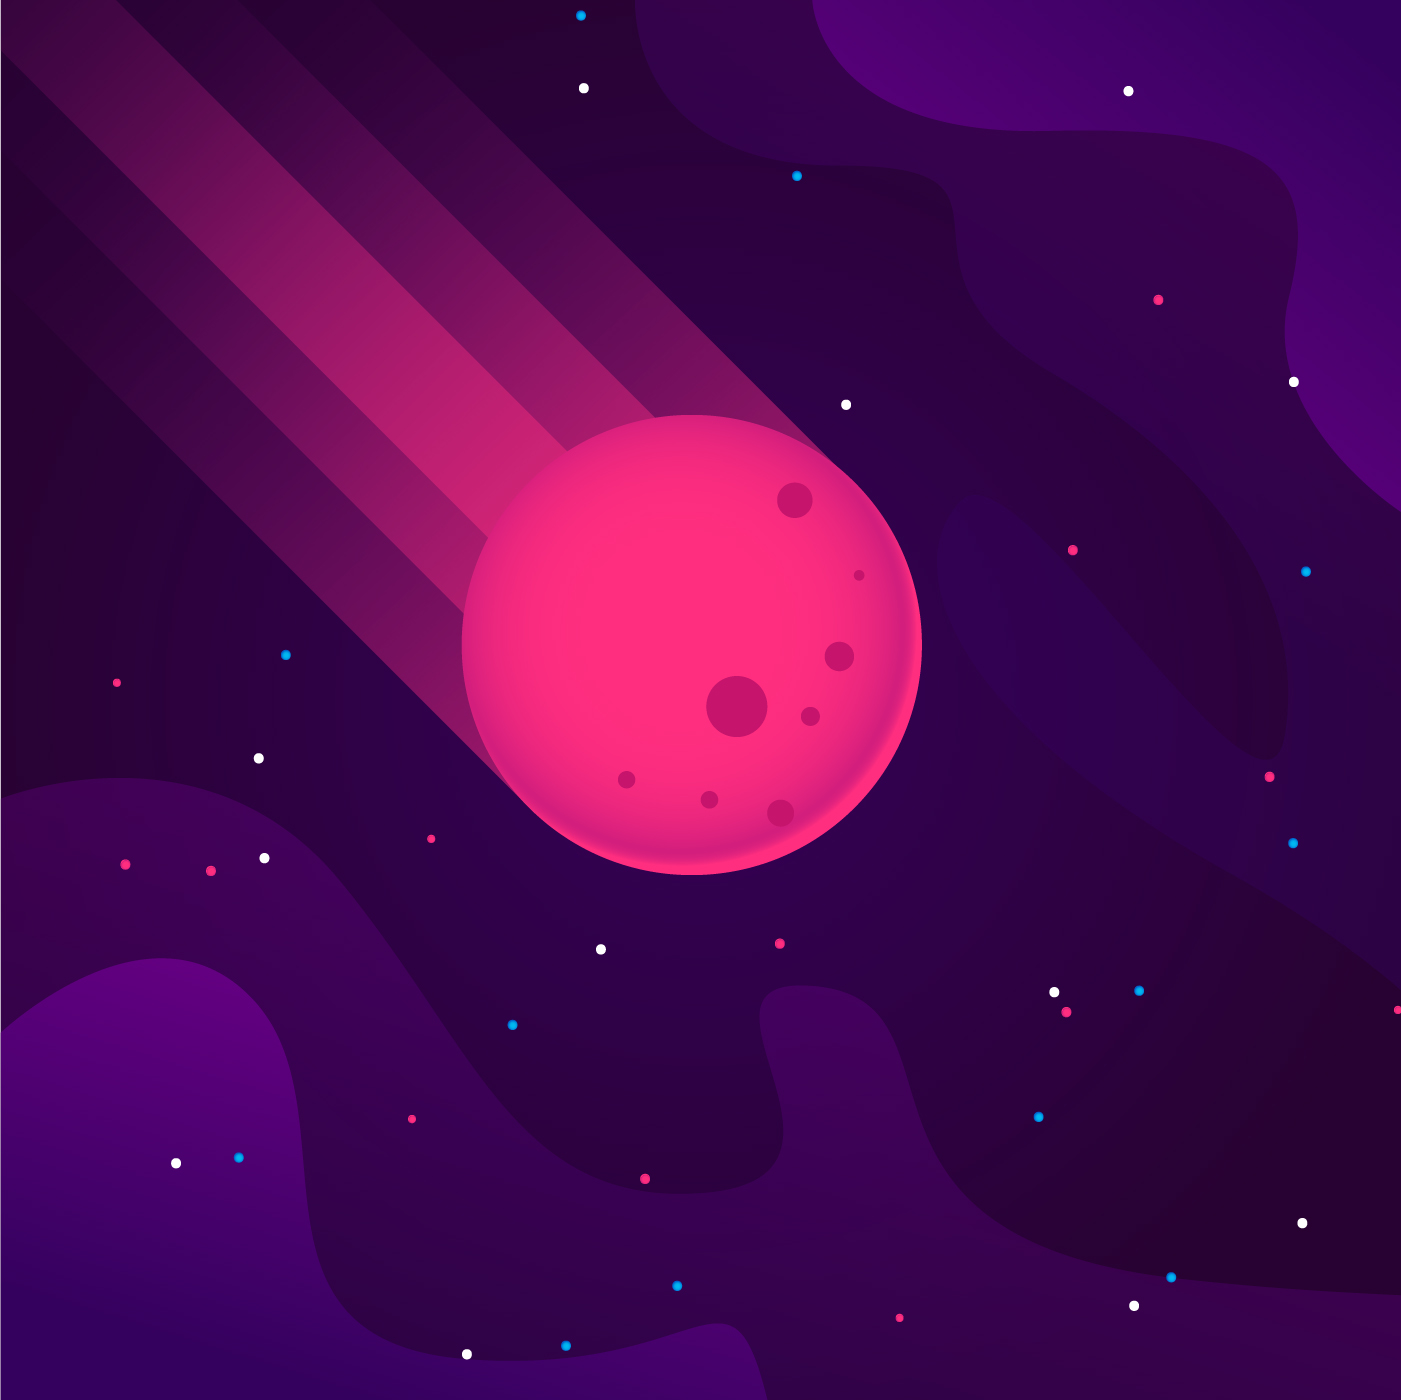 Falling Meteor Illustration Download Free Vectors